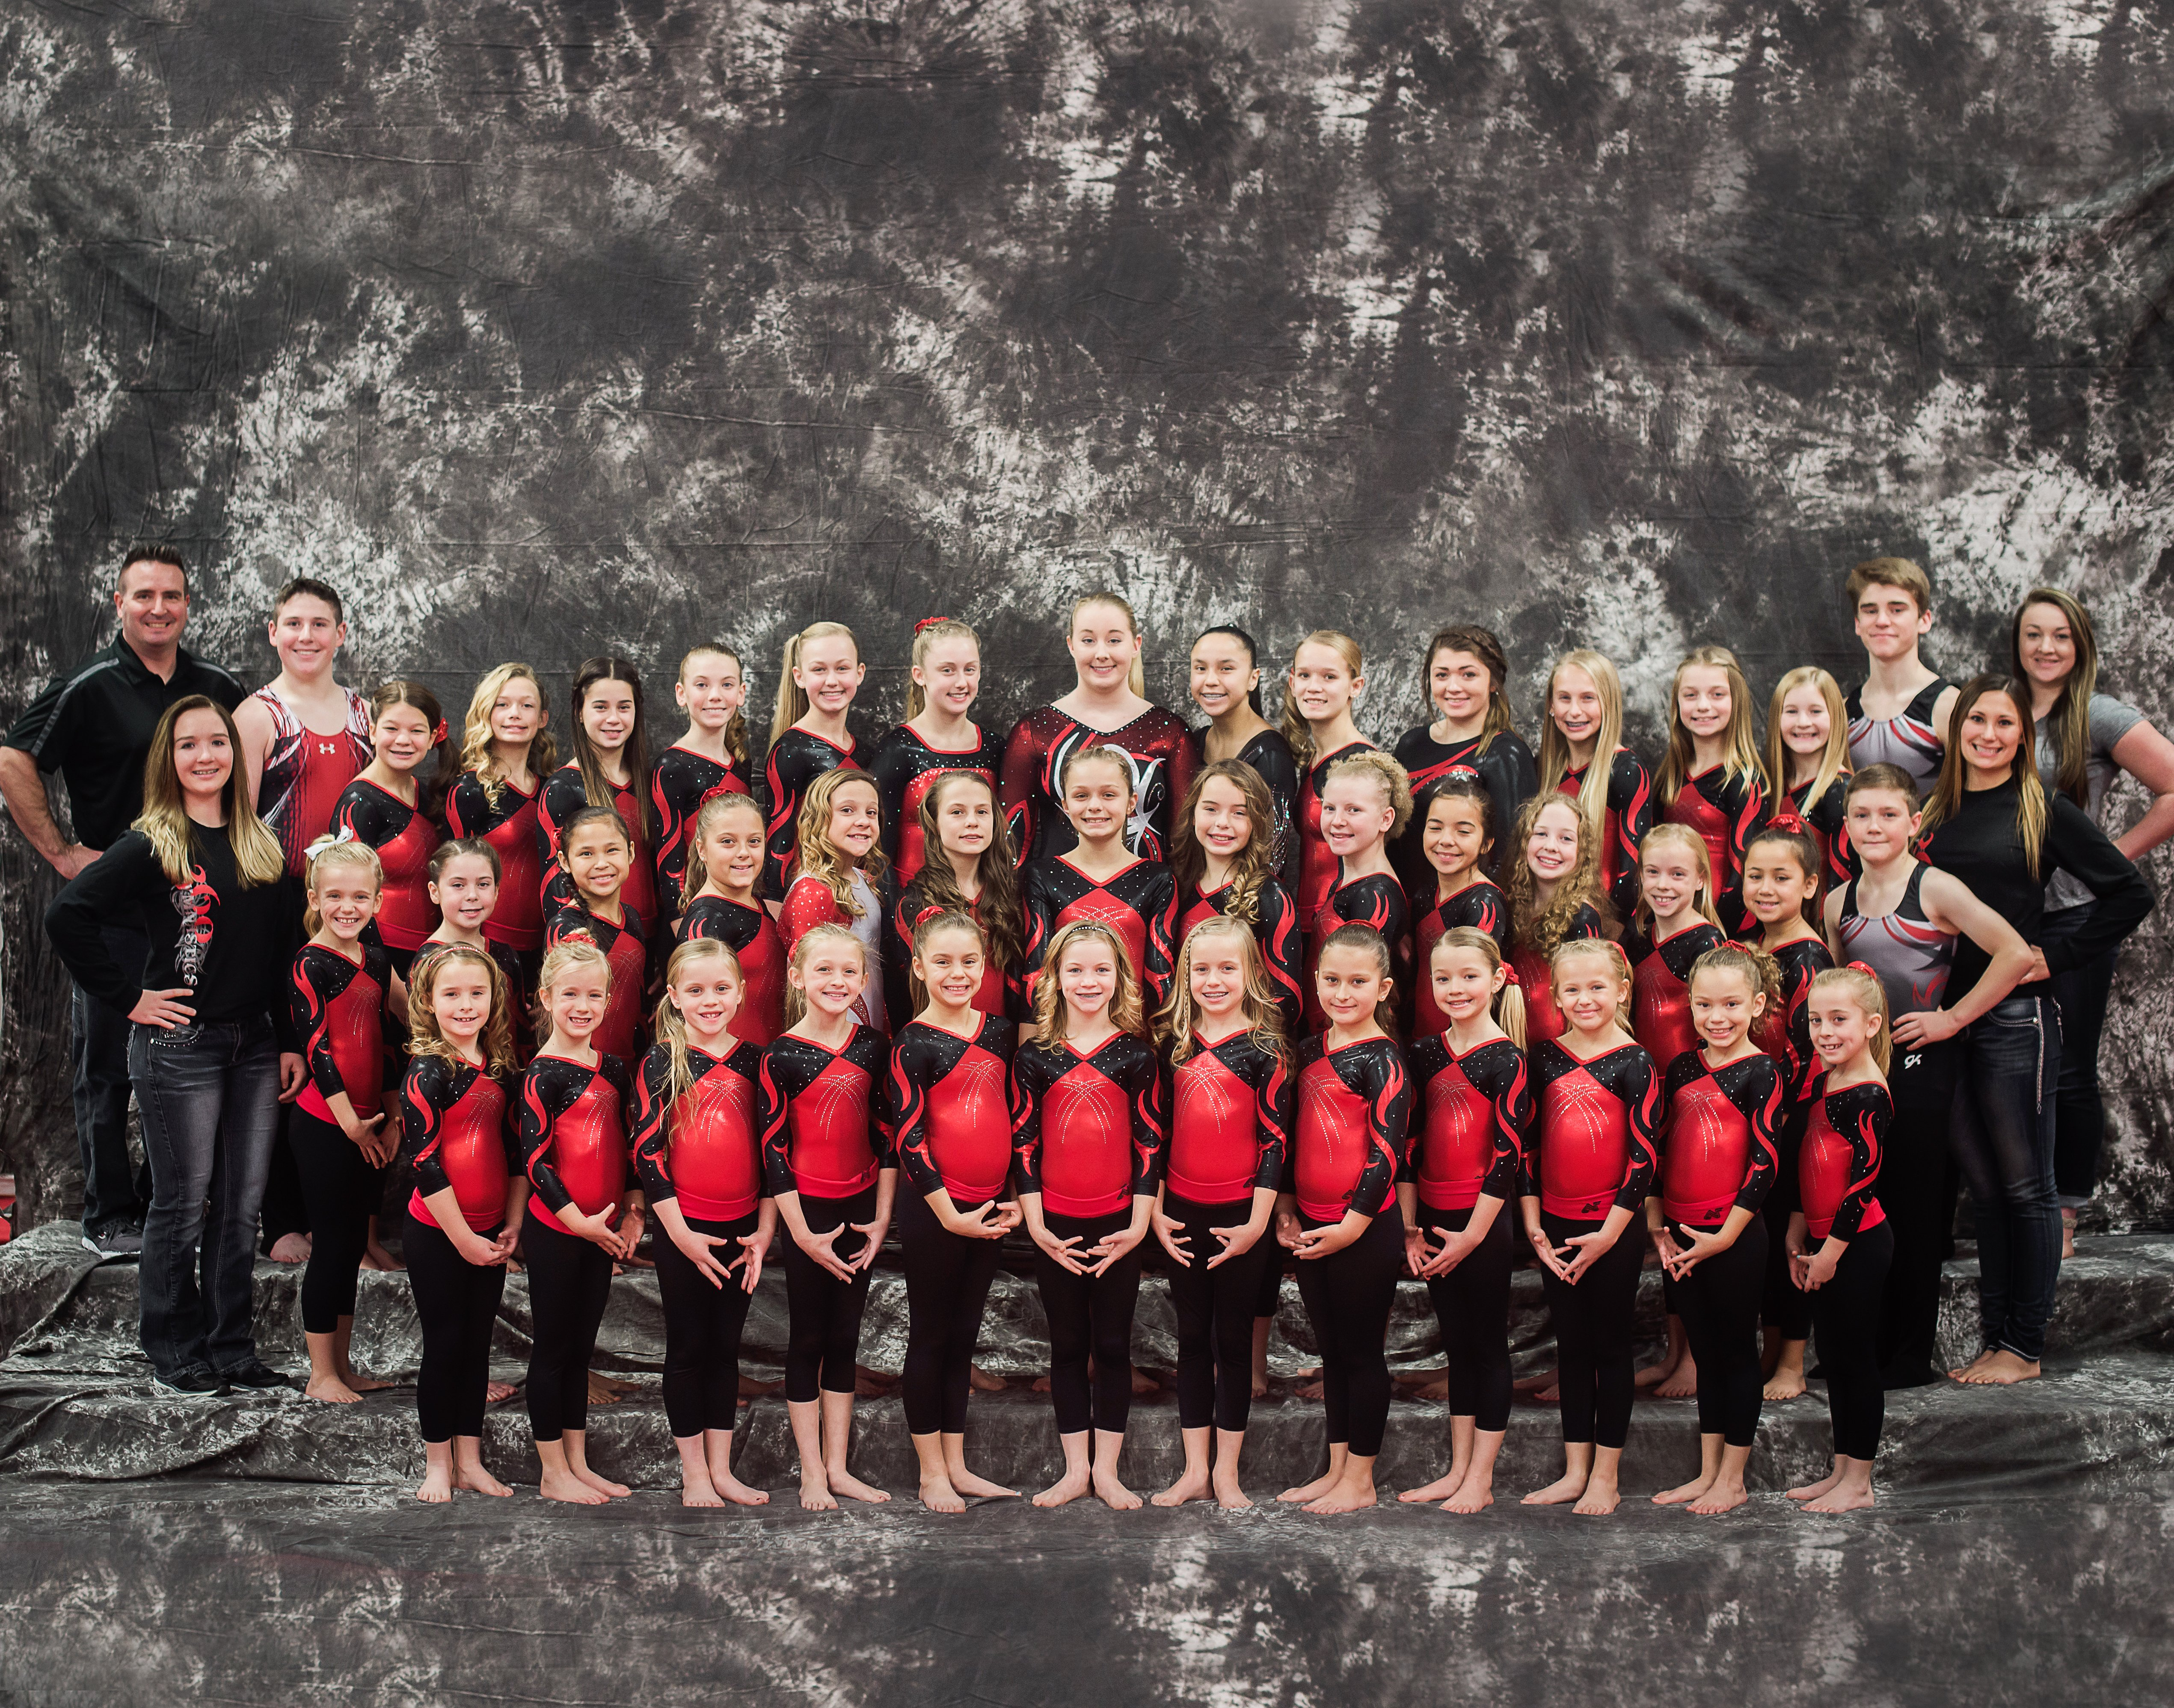 2017 360 Gymnastics Team